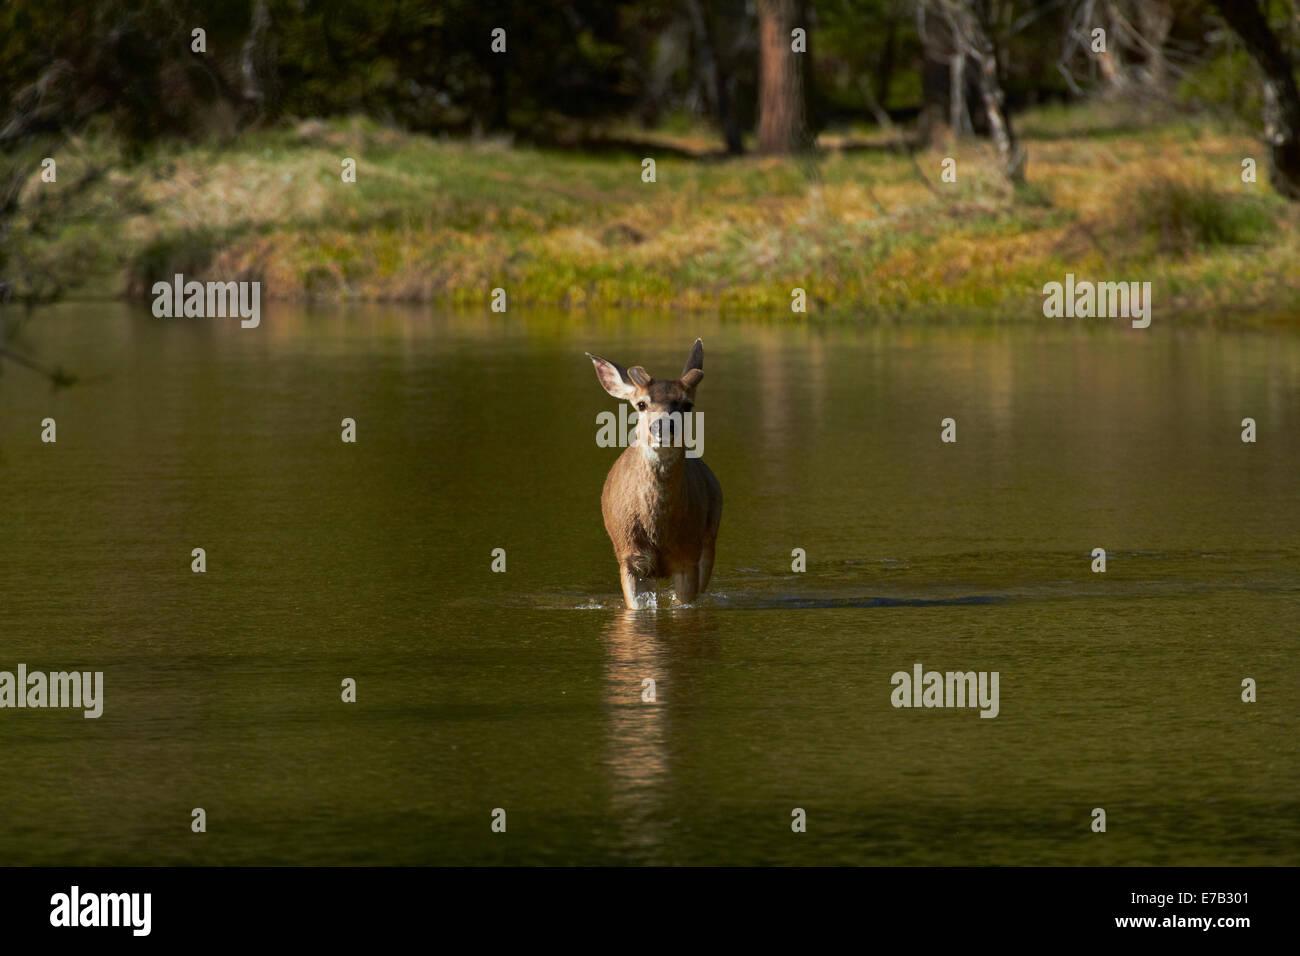 Maultierhirsch (Odocoileus Hemionus) Mirror Lake, Tenaya Canyon, Yosemite-Nationalpark, Kalifornien, USA Stockbild